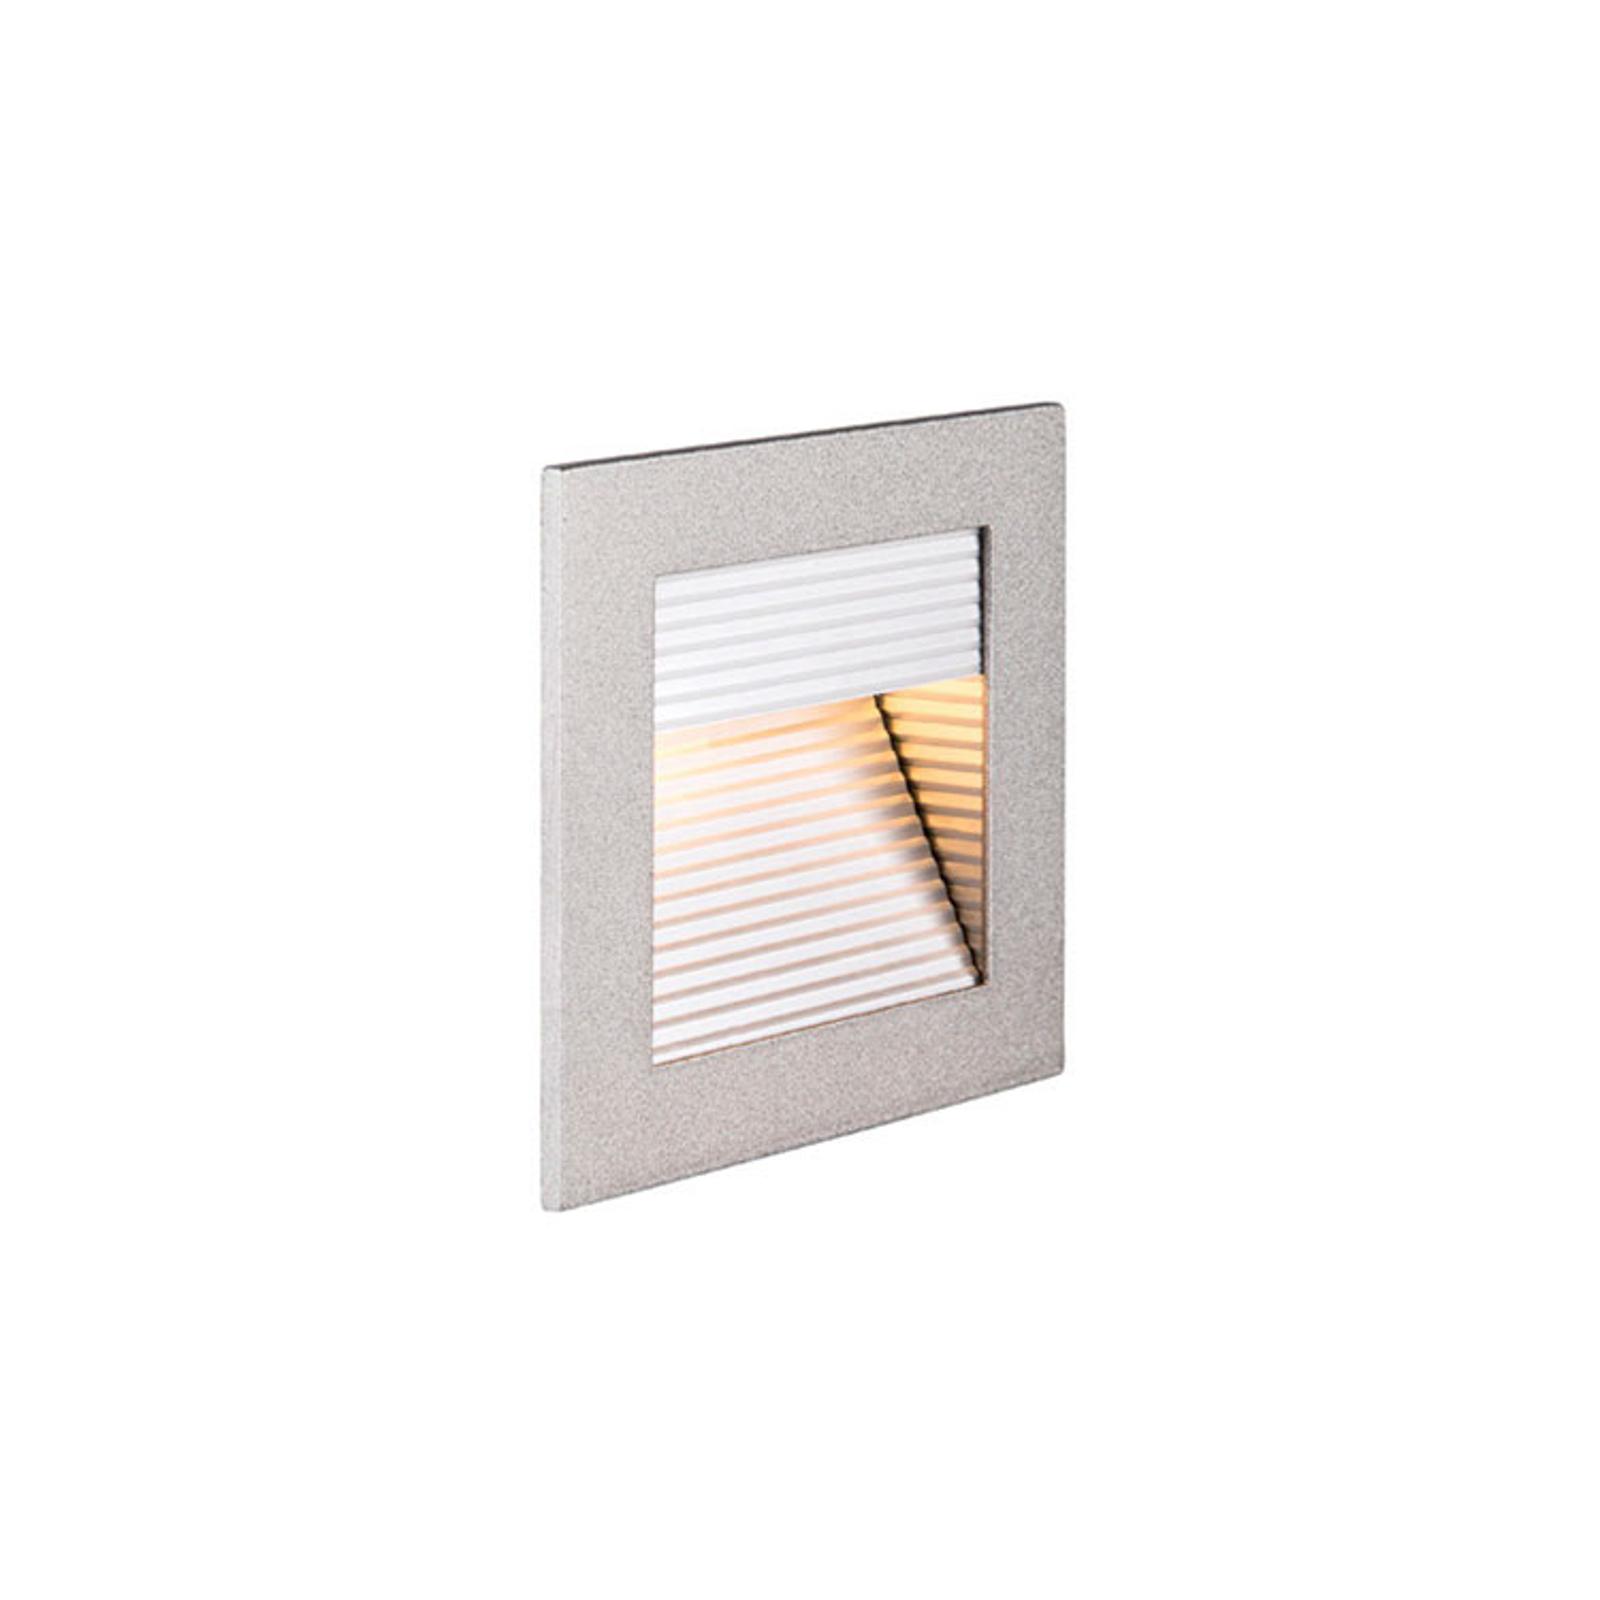 SLV Frame Curve oprawa wpuszczana LED srebrna